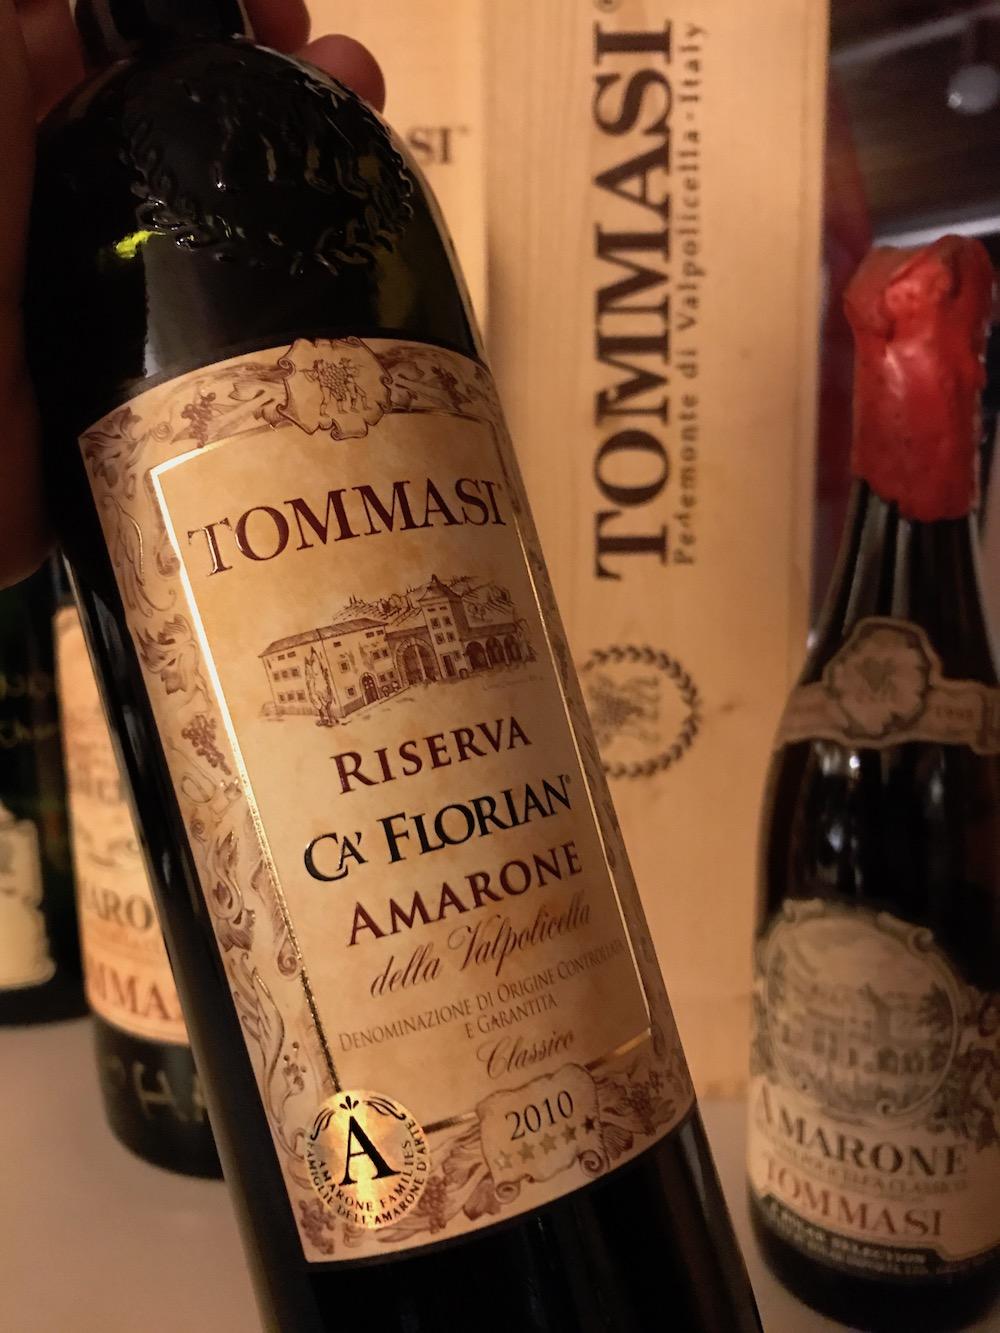 Tommasi-Amarone.jpg